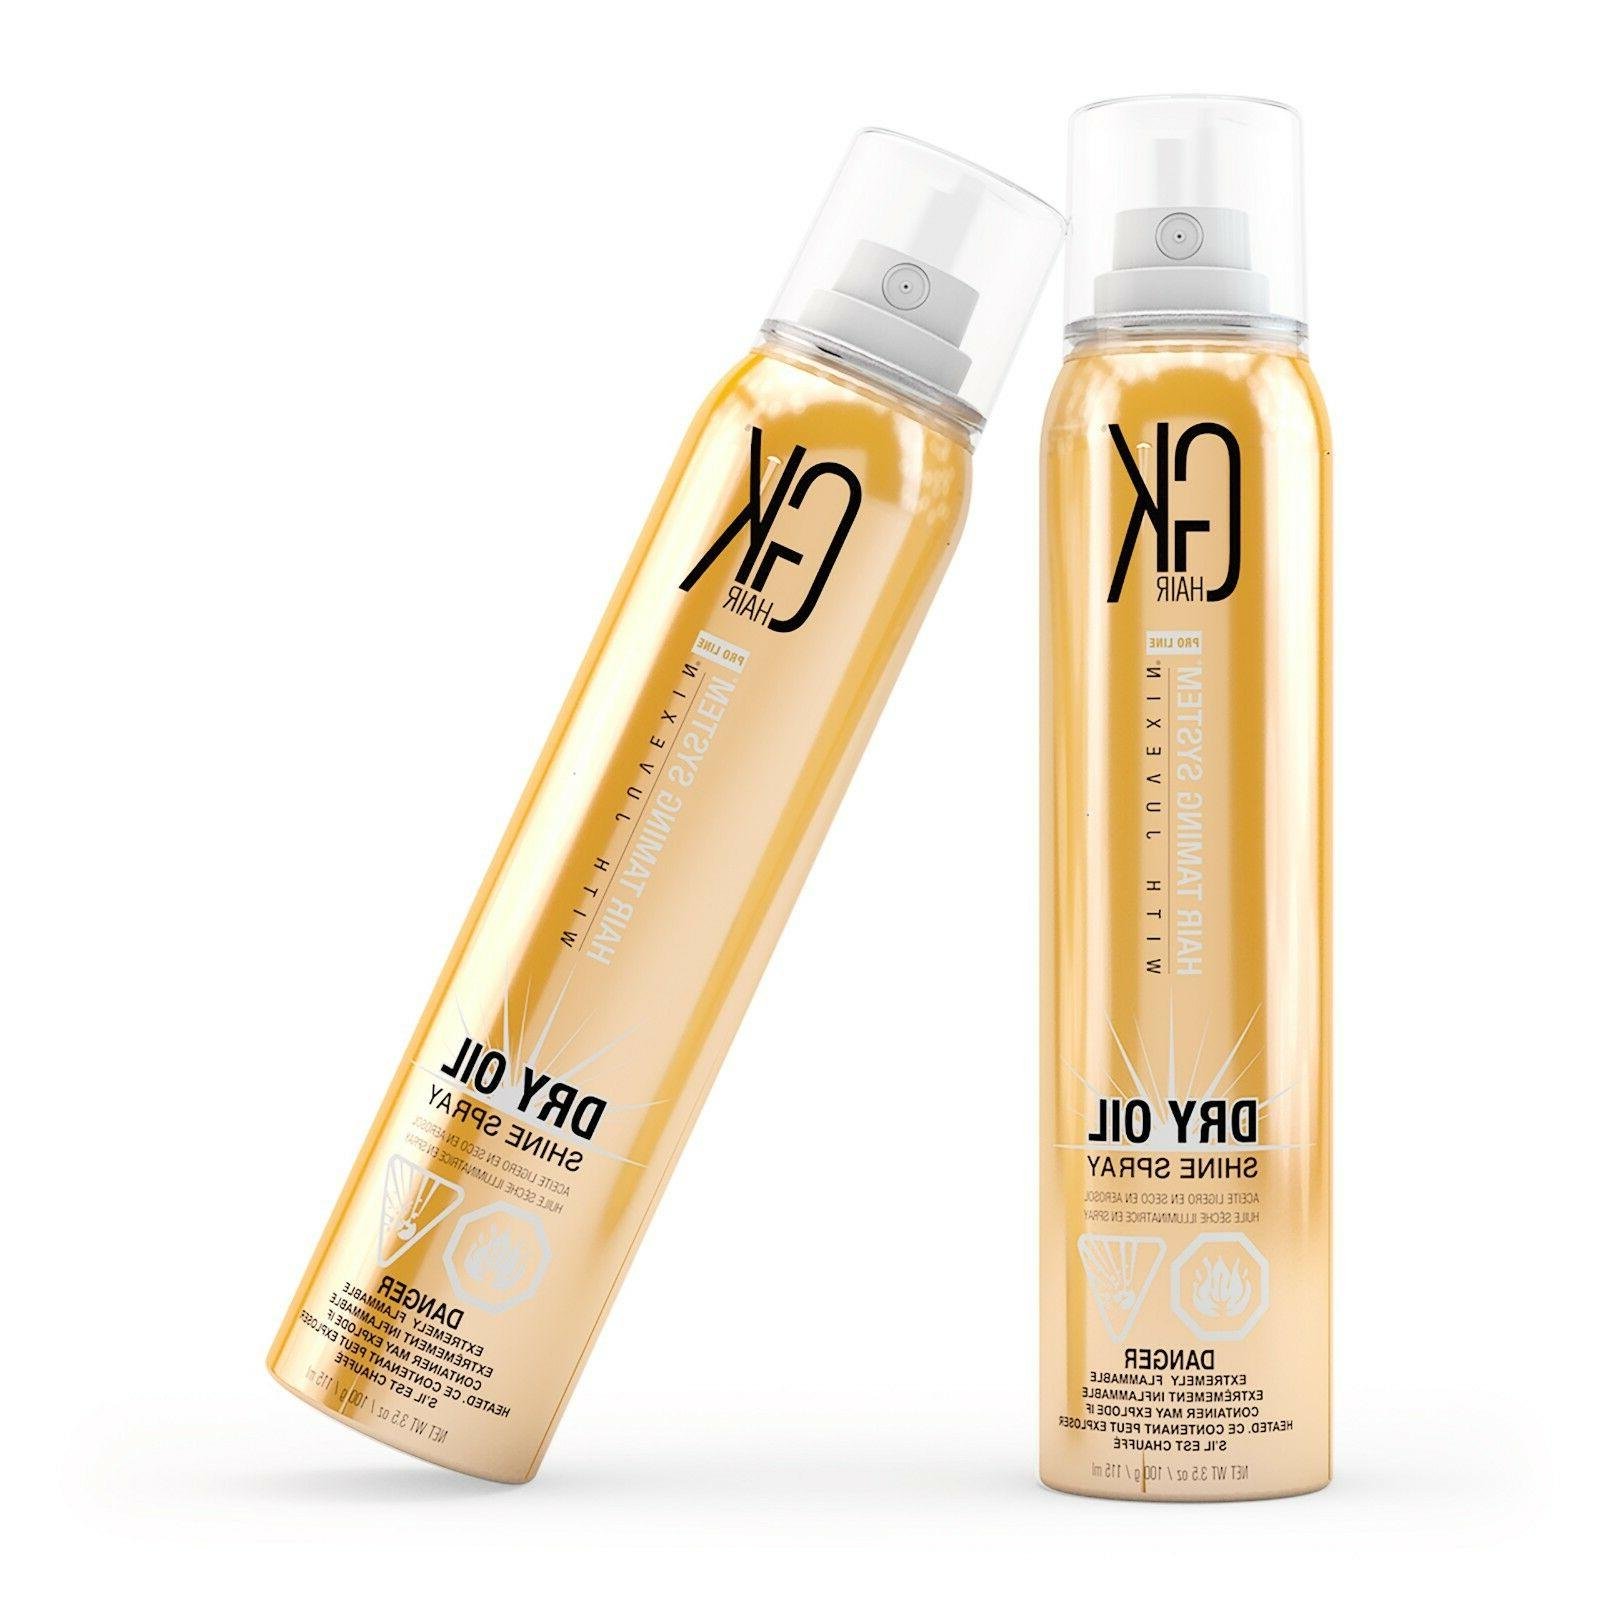 GKhair Dry Oil Shine Keratin Frizz Shining 3.8oz